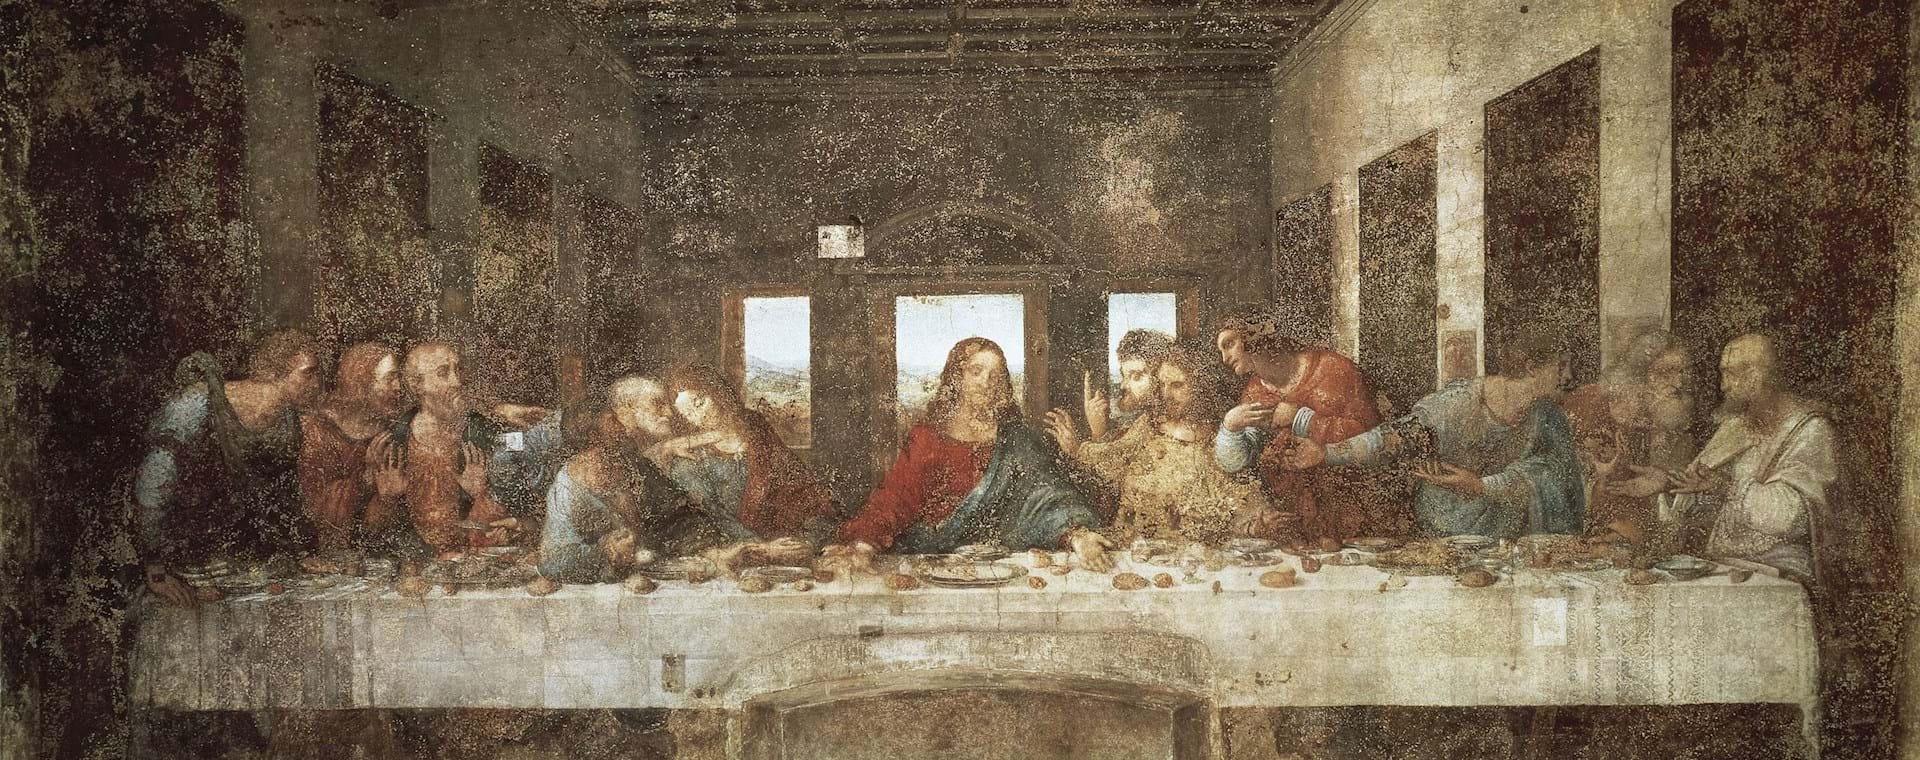 Best of Milan Duomo Cathedral & Da Vinci's 'Last Supper' Tour